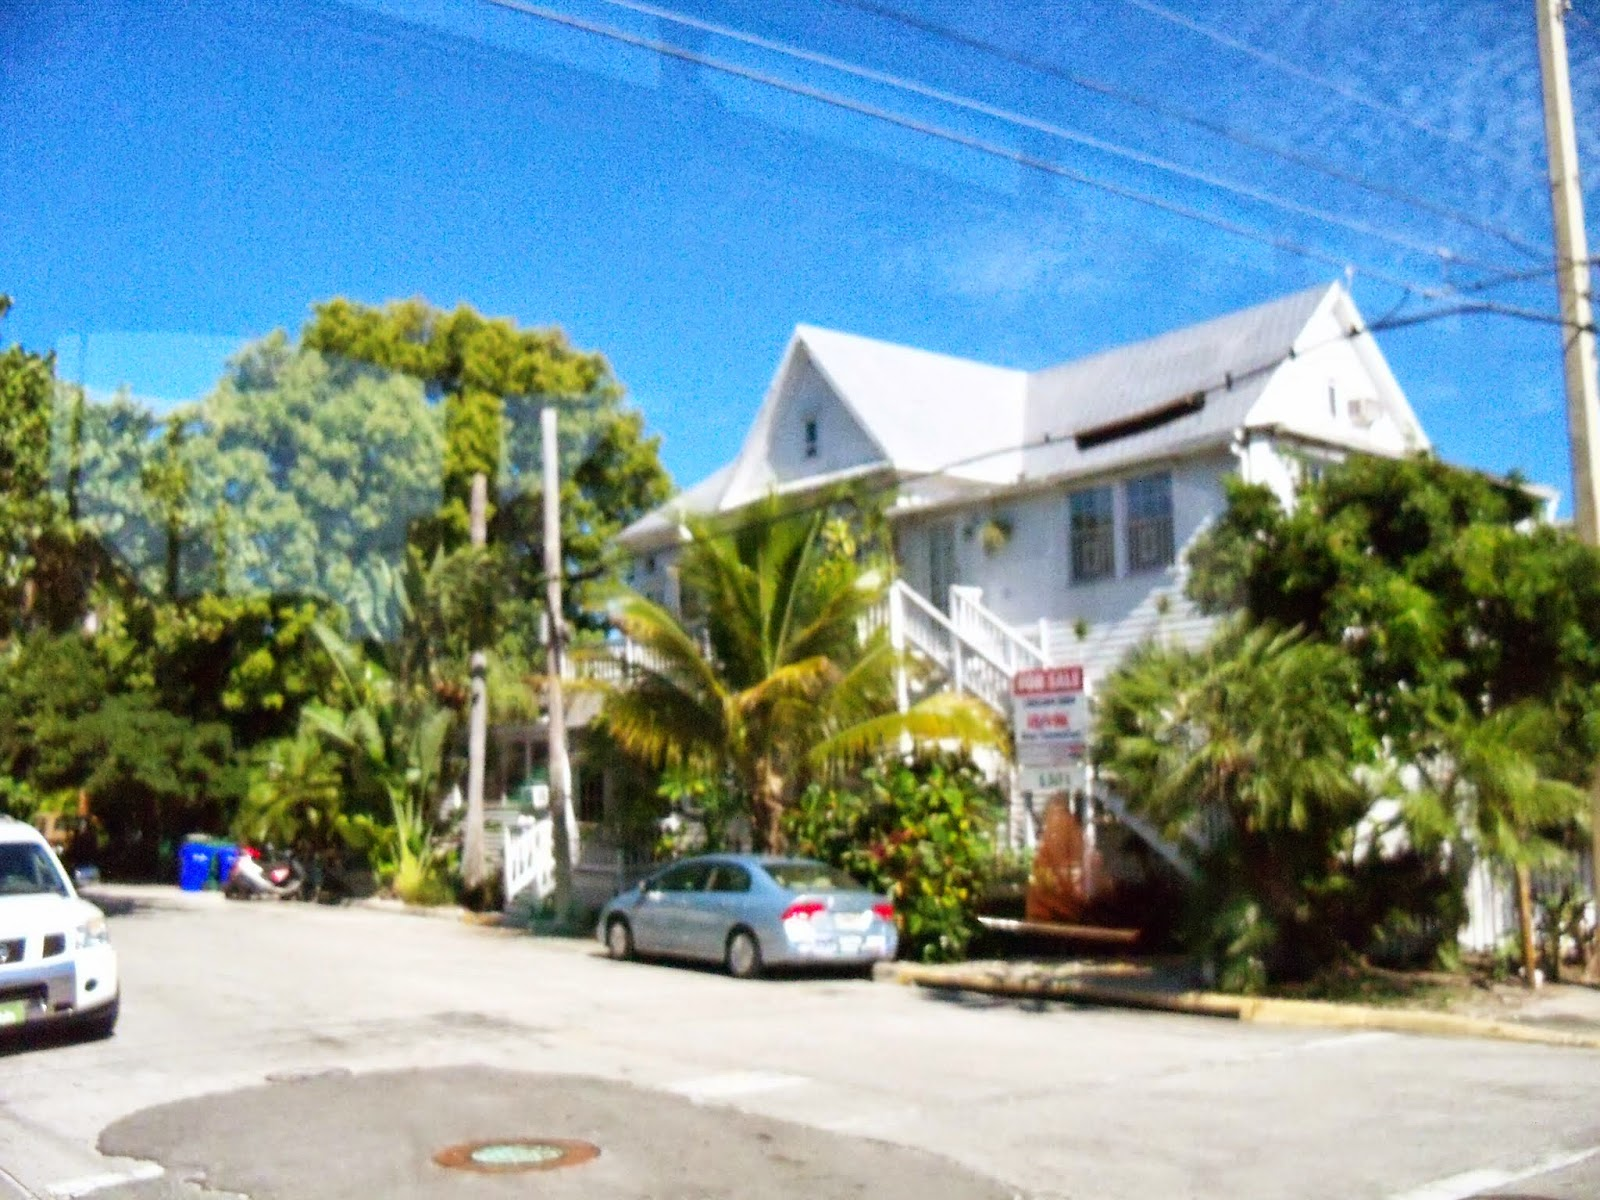 Key West Vacation - 116_5755.JPG